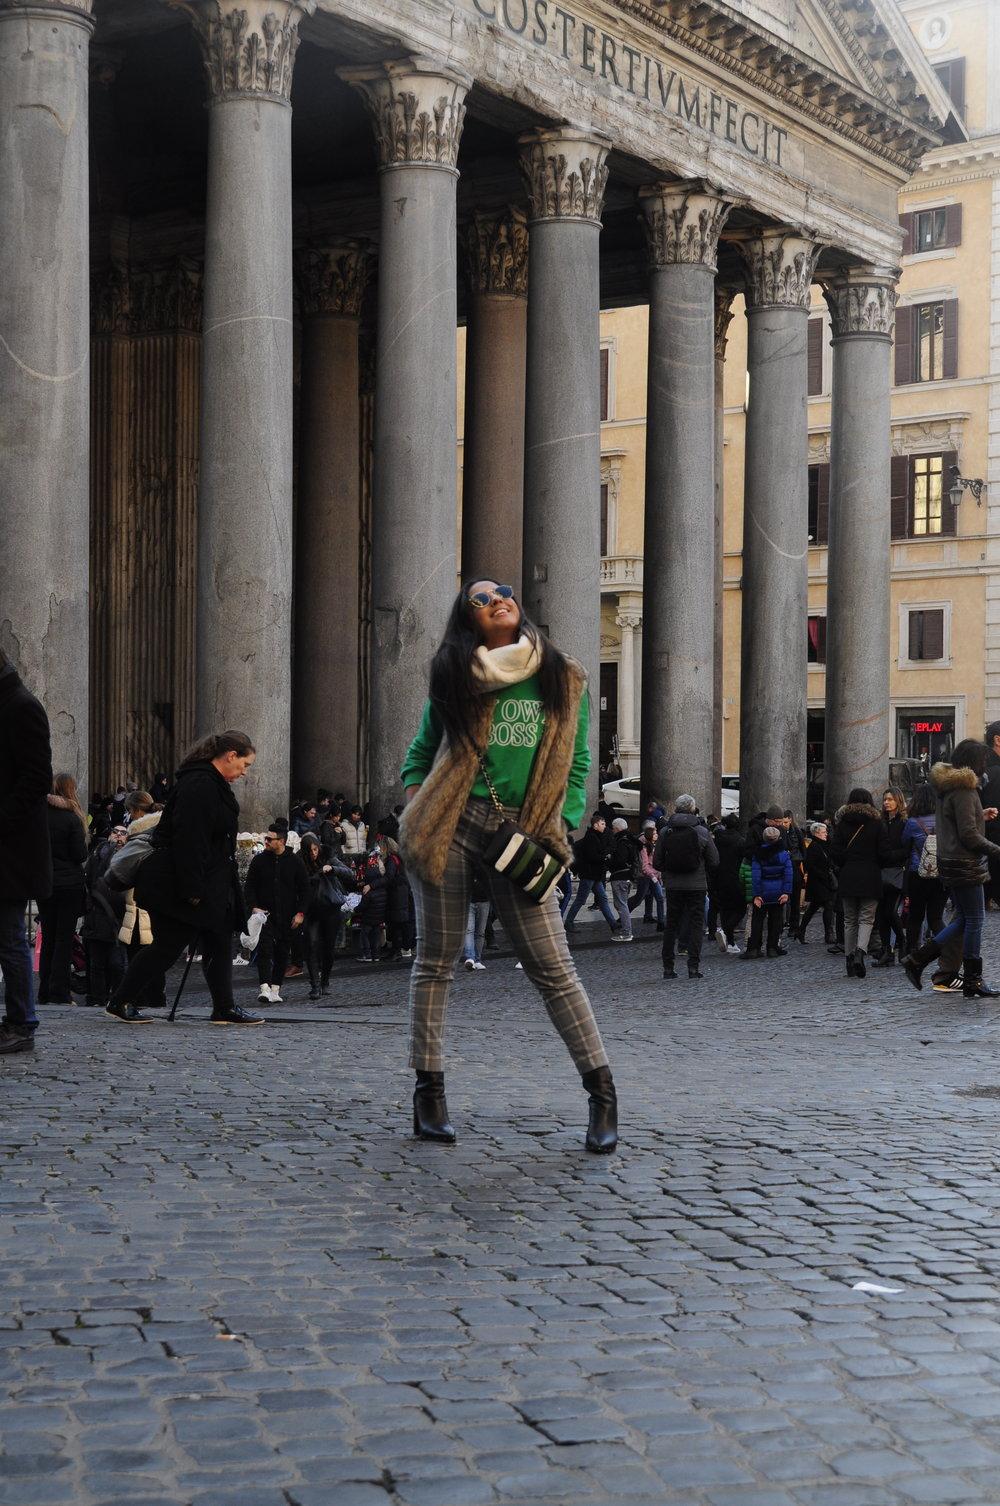 fashion travel blogger ideas xmas much needed paloma de la cruz inspiración fluir